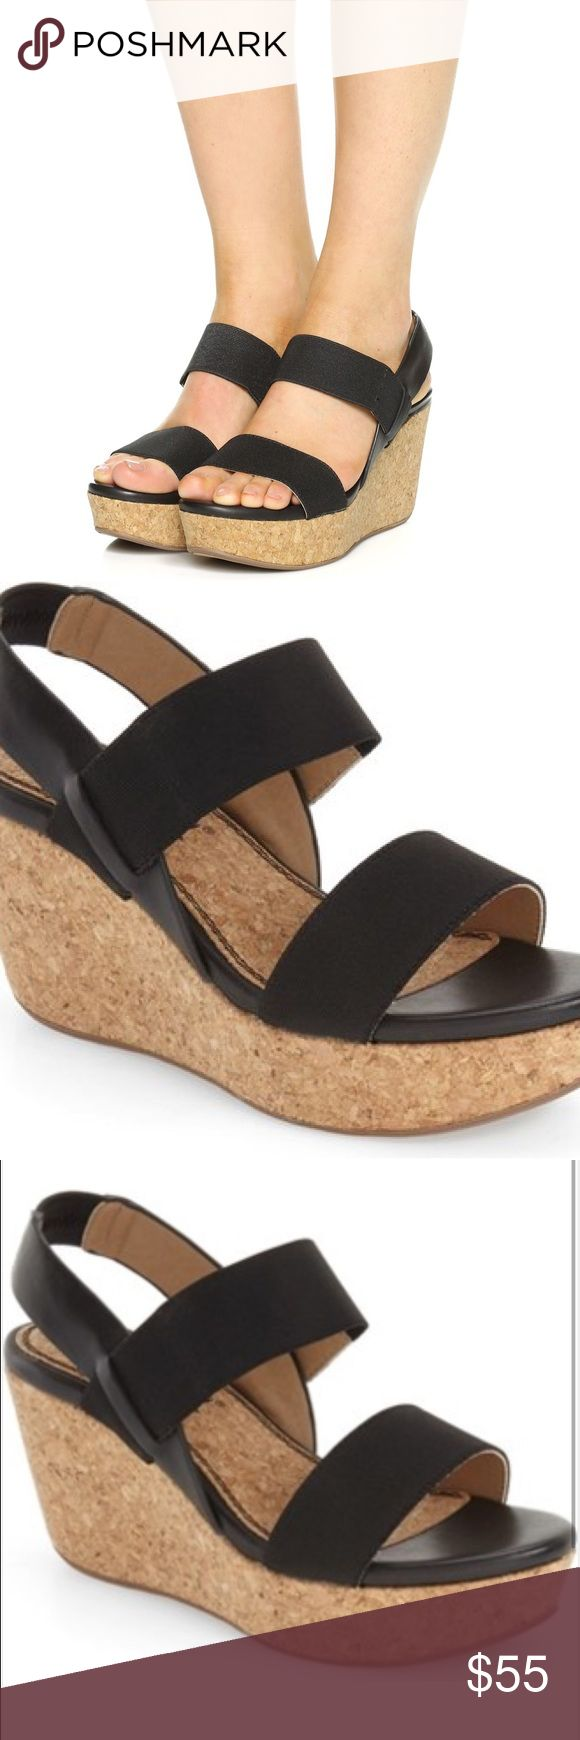 Splendid Black Wedge Sandal, 7.5 Classic black wedge, brand new in box. Versatile shoe, size 7.5 Splendid Shoes Wedges